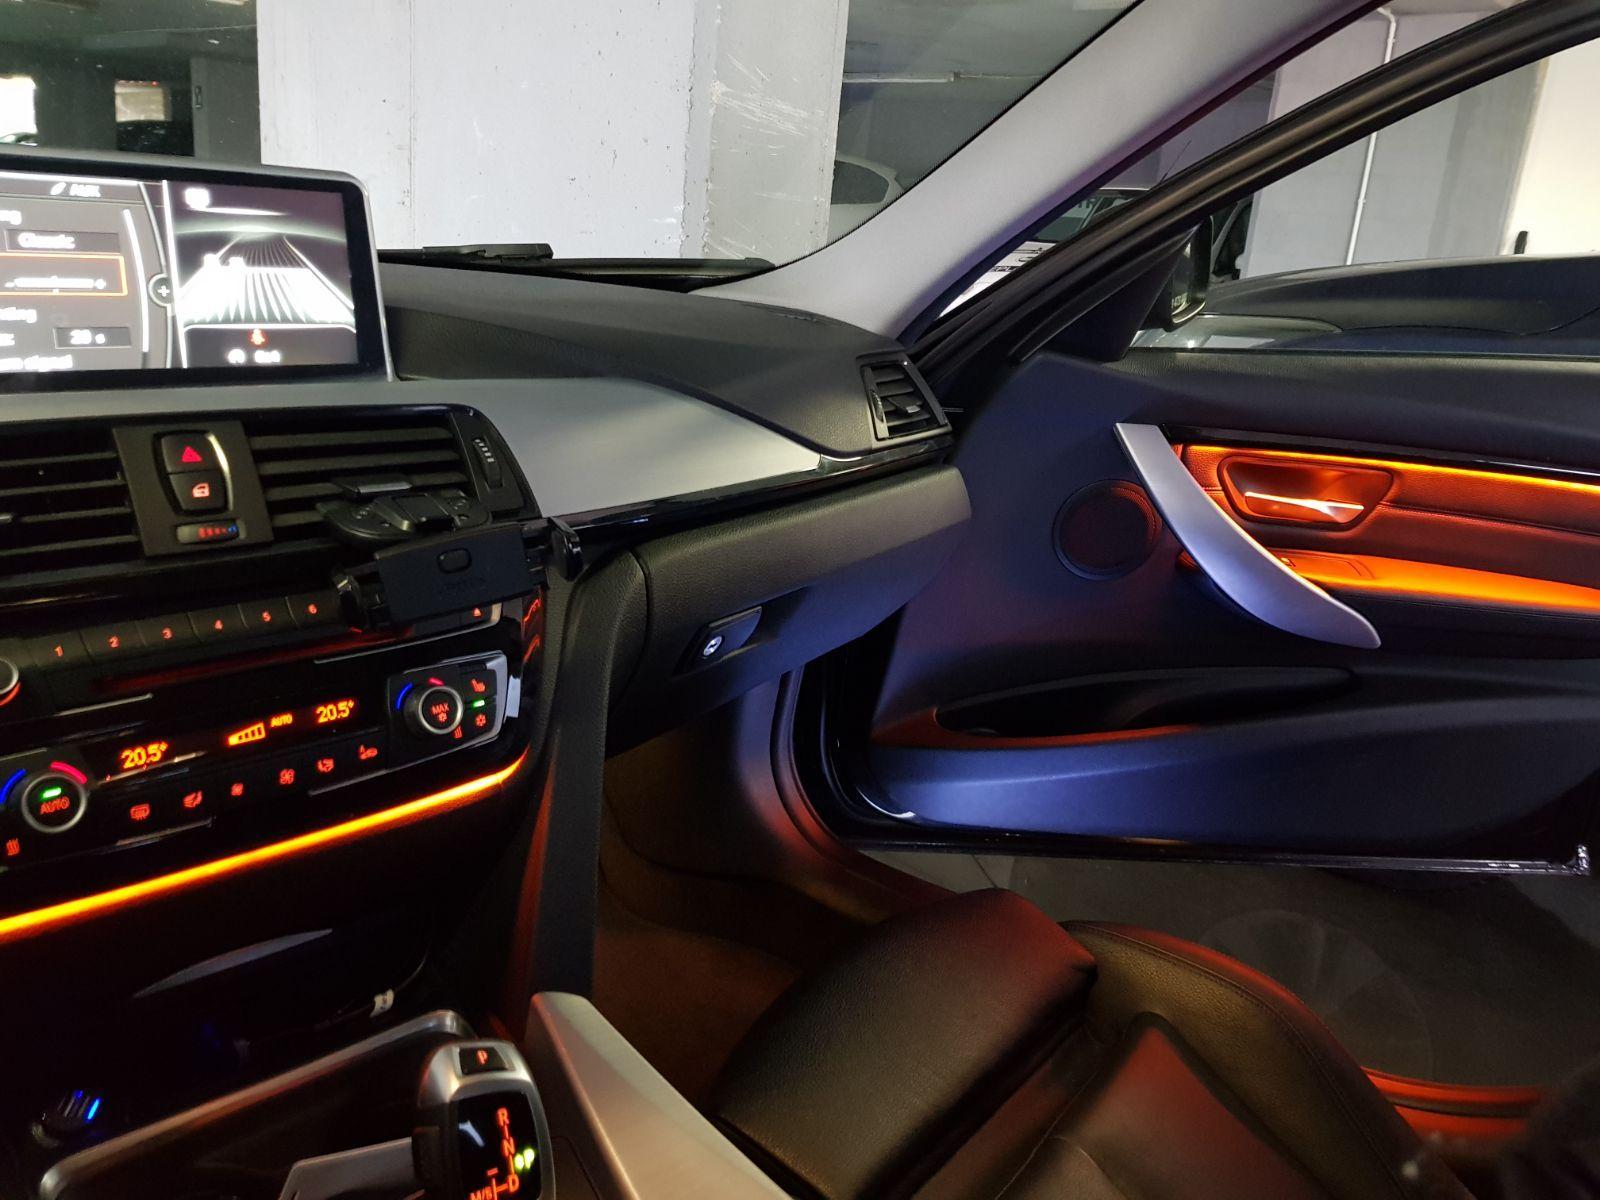 medium resolution of high quality after market bmw f30 interior door panel decorative trim led ambient lights lighting upgrade by retrofit kits